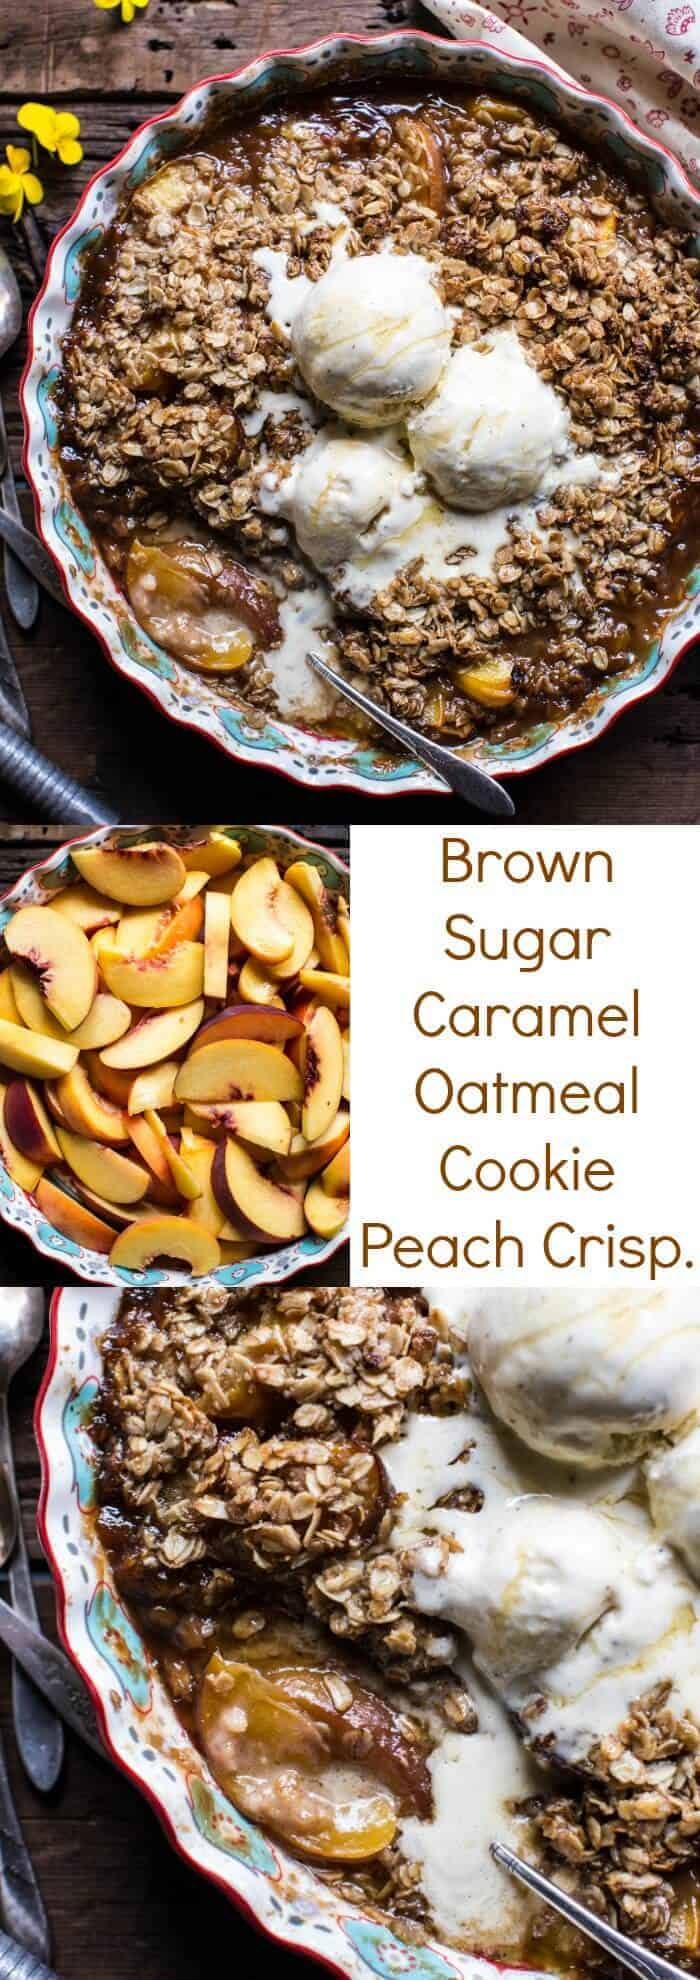 Brown Sugar Caramel Oatmeal Cookie Peach Crisp | halfbakedharvest.com @hbharvest